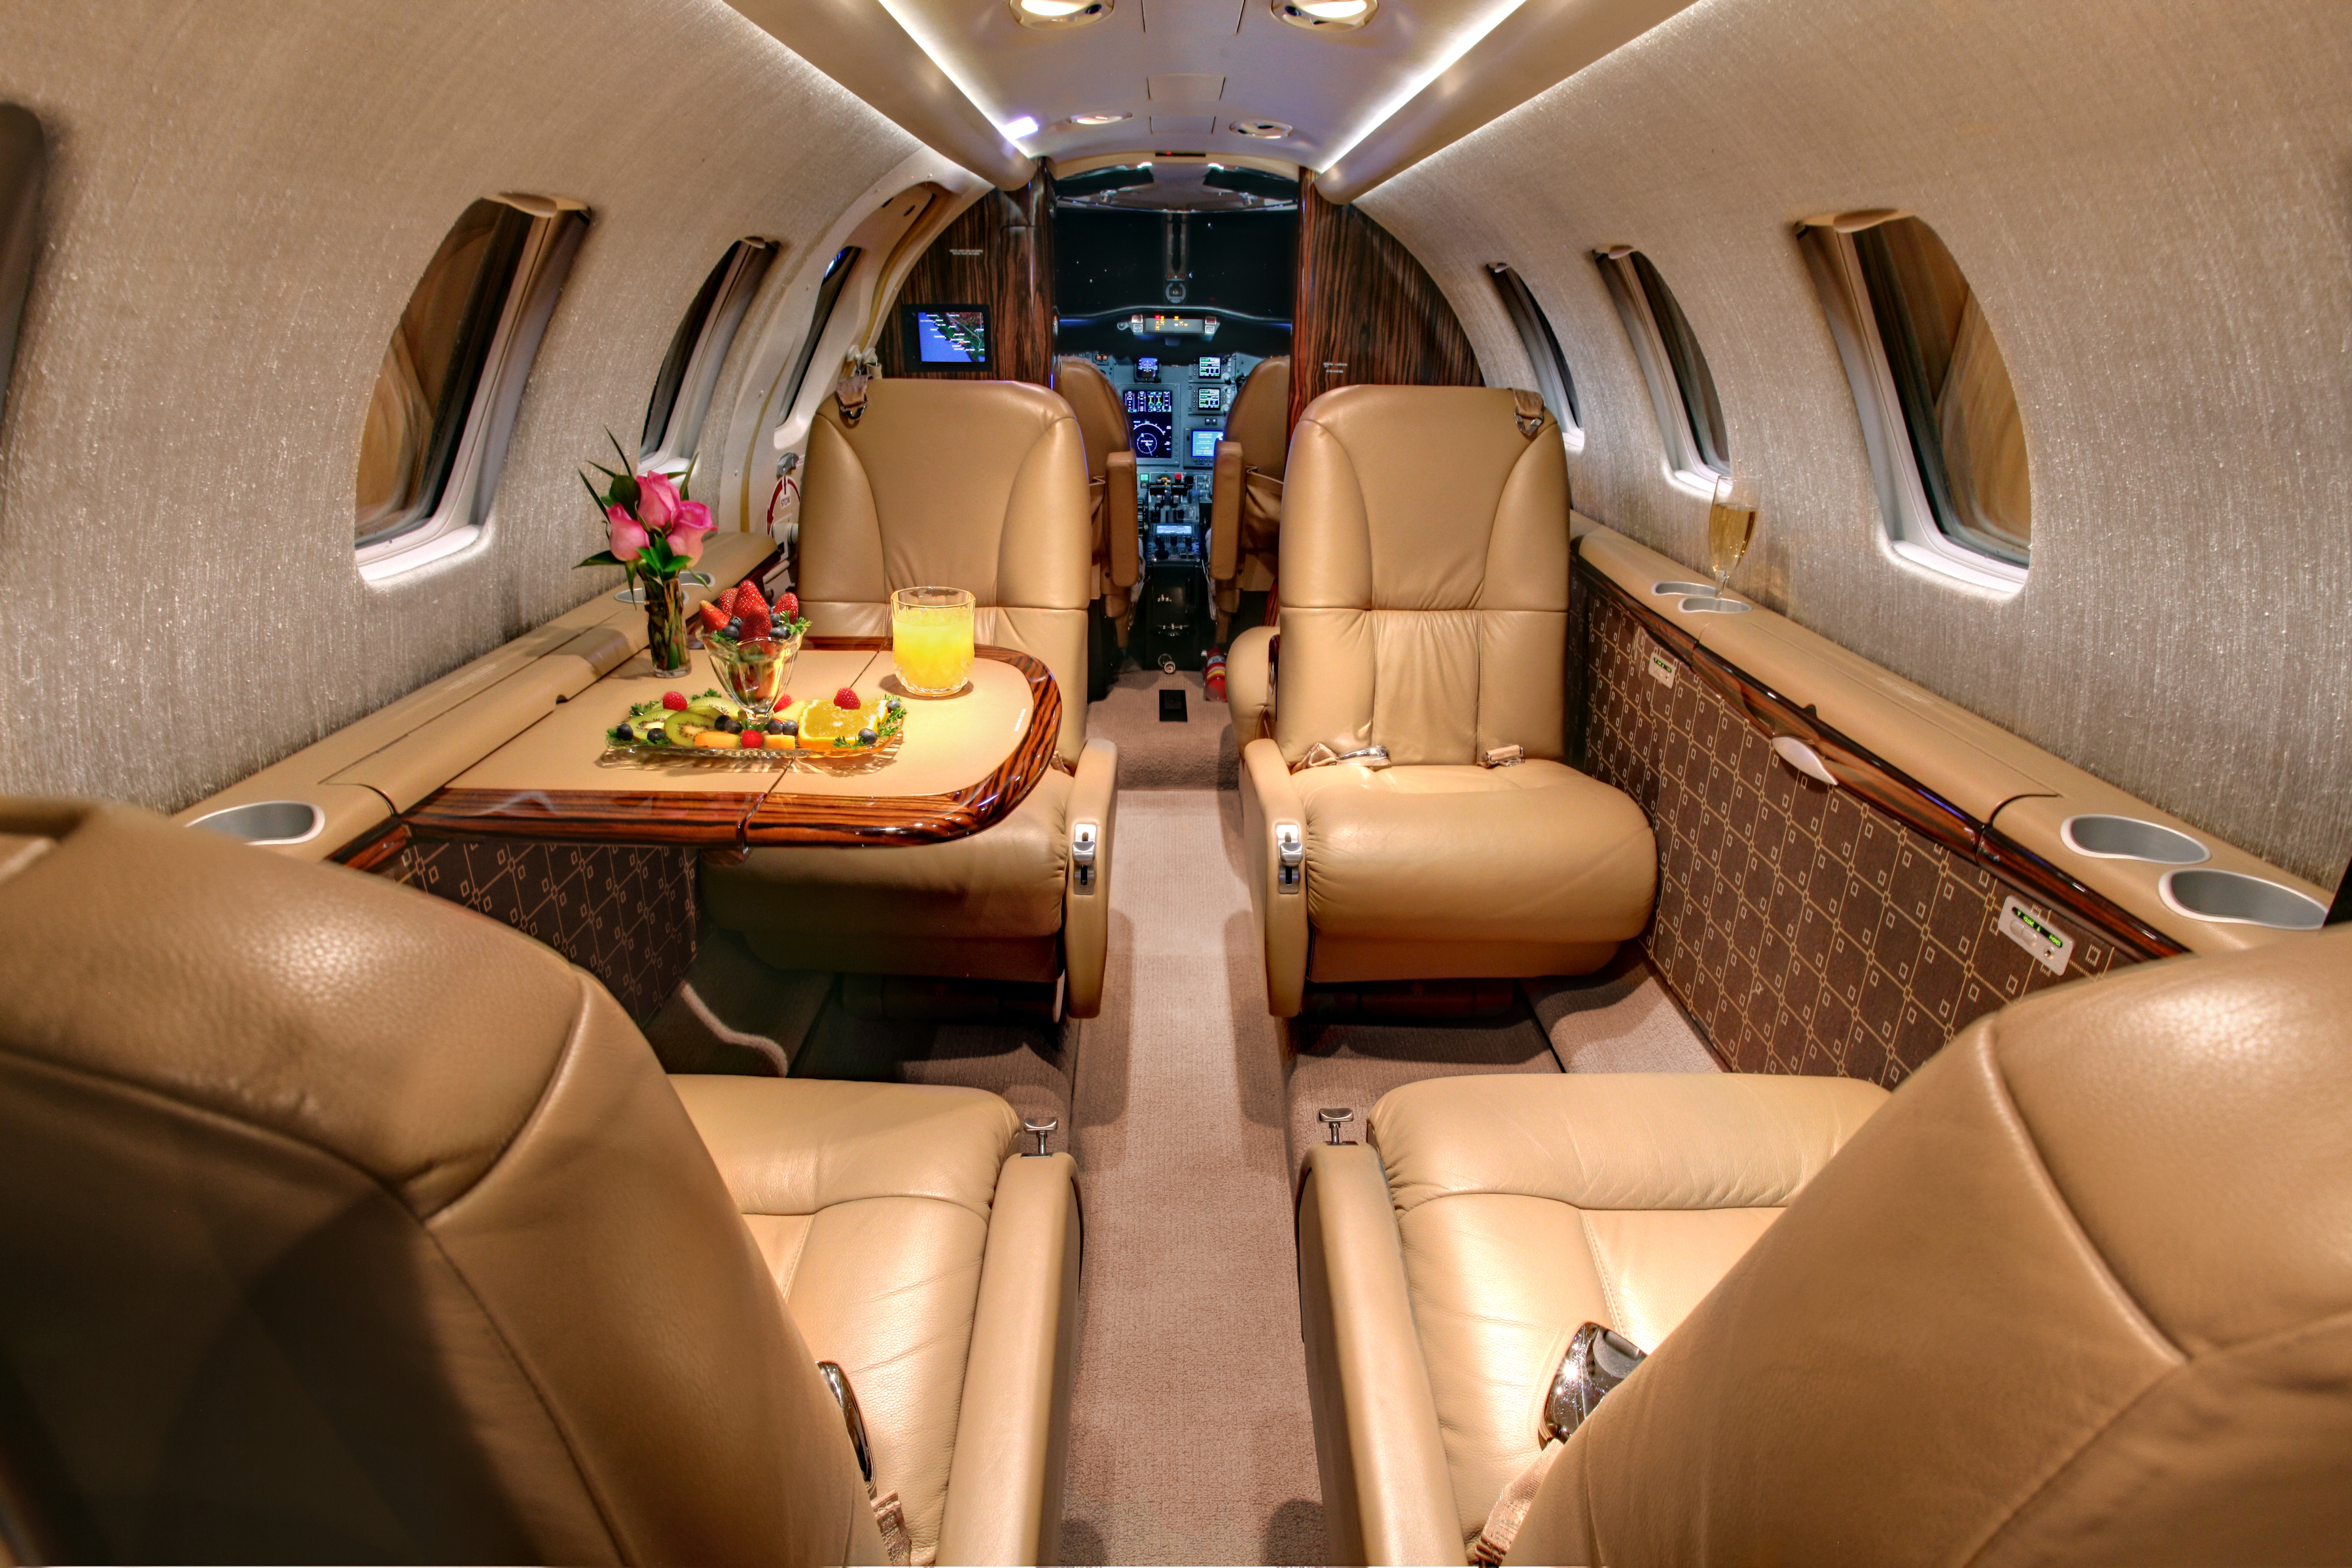 Premier Jet Aviation Jetav 2007 Citation Cj1 S N 525 0653 Sold